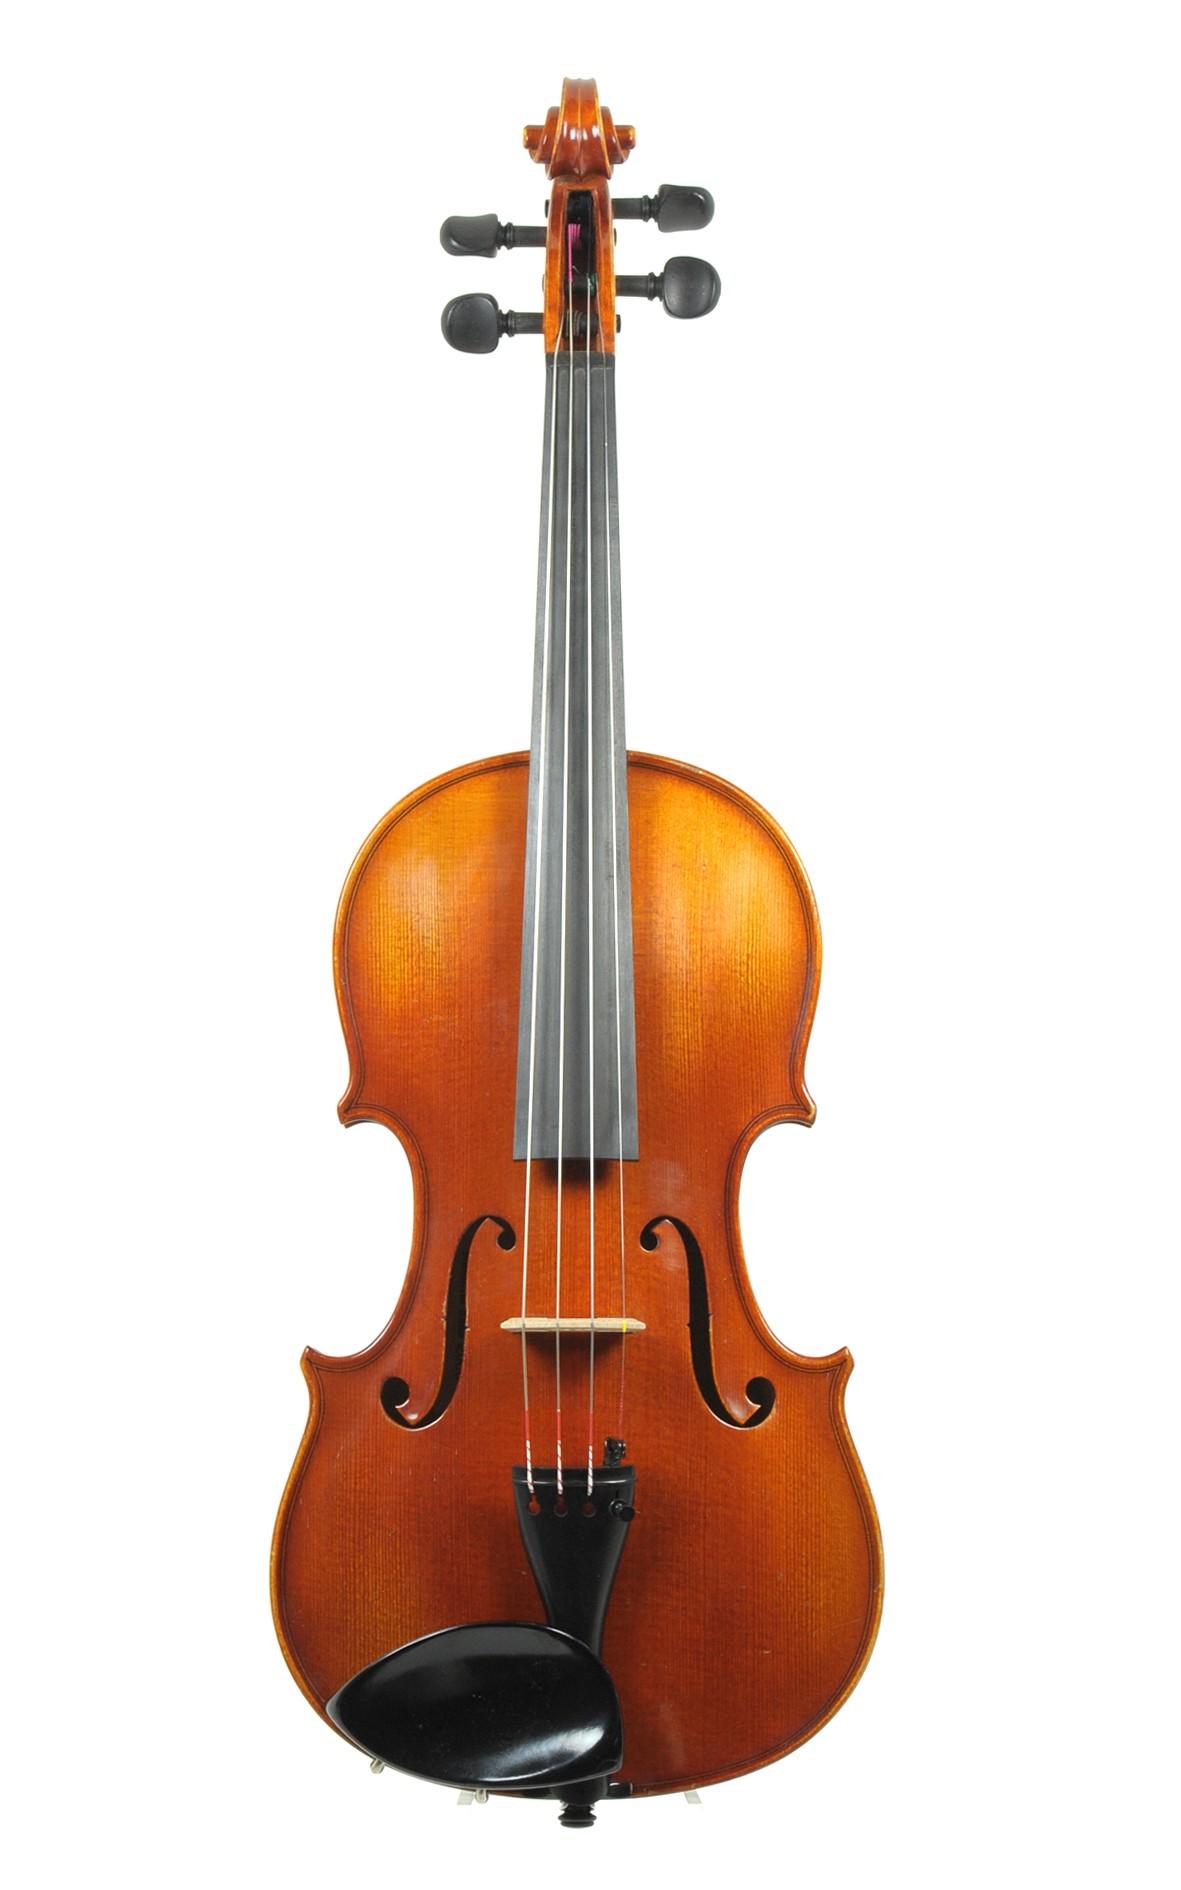 Franz Sandner, good sounding German violin